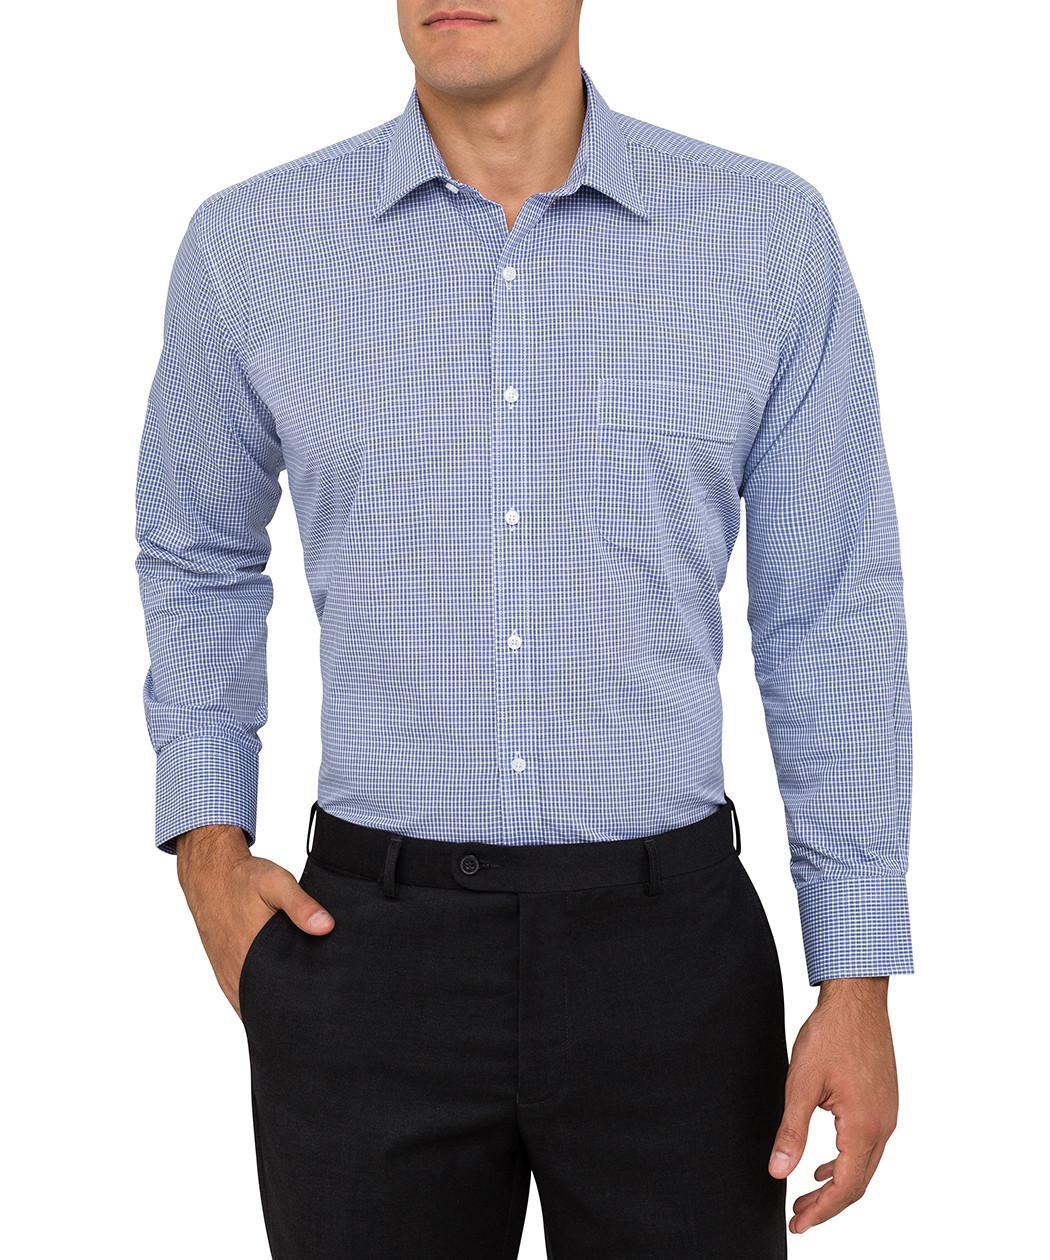 b78f74a05e0 ... Van Heusen Blue Check Classic Fit Shirt. Product Image · Image 1 ...